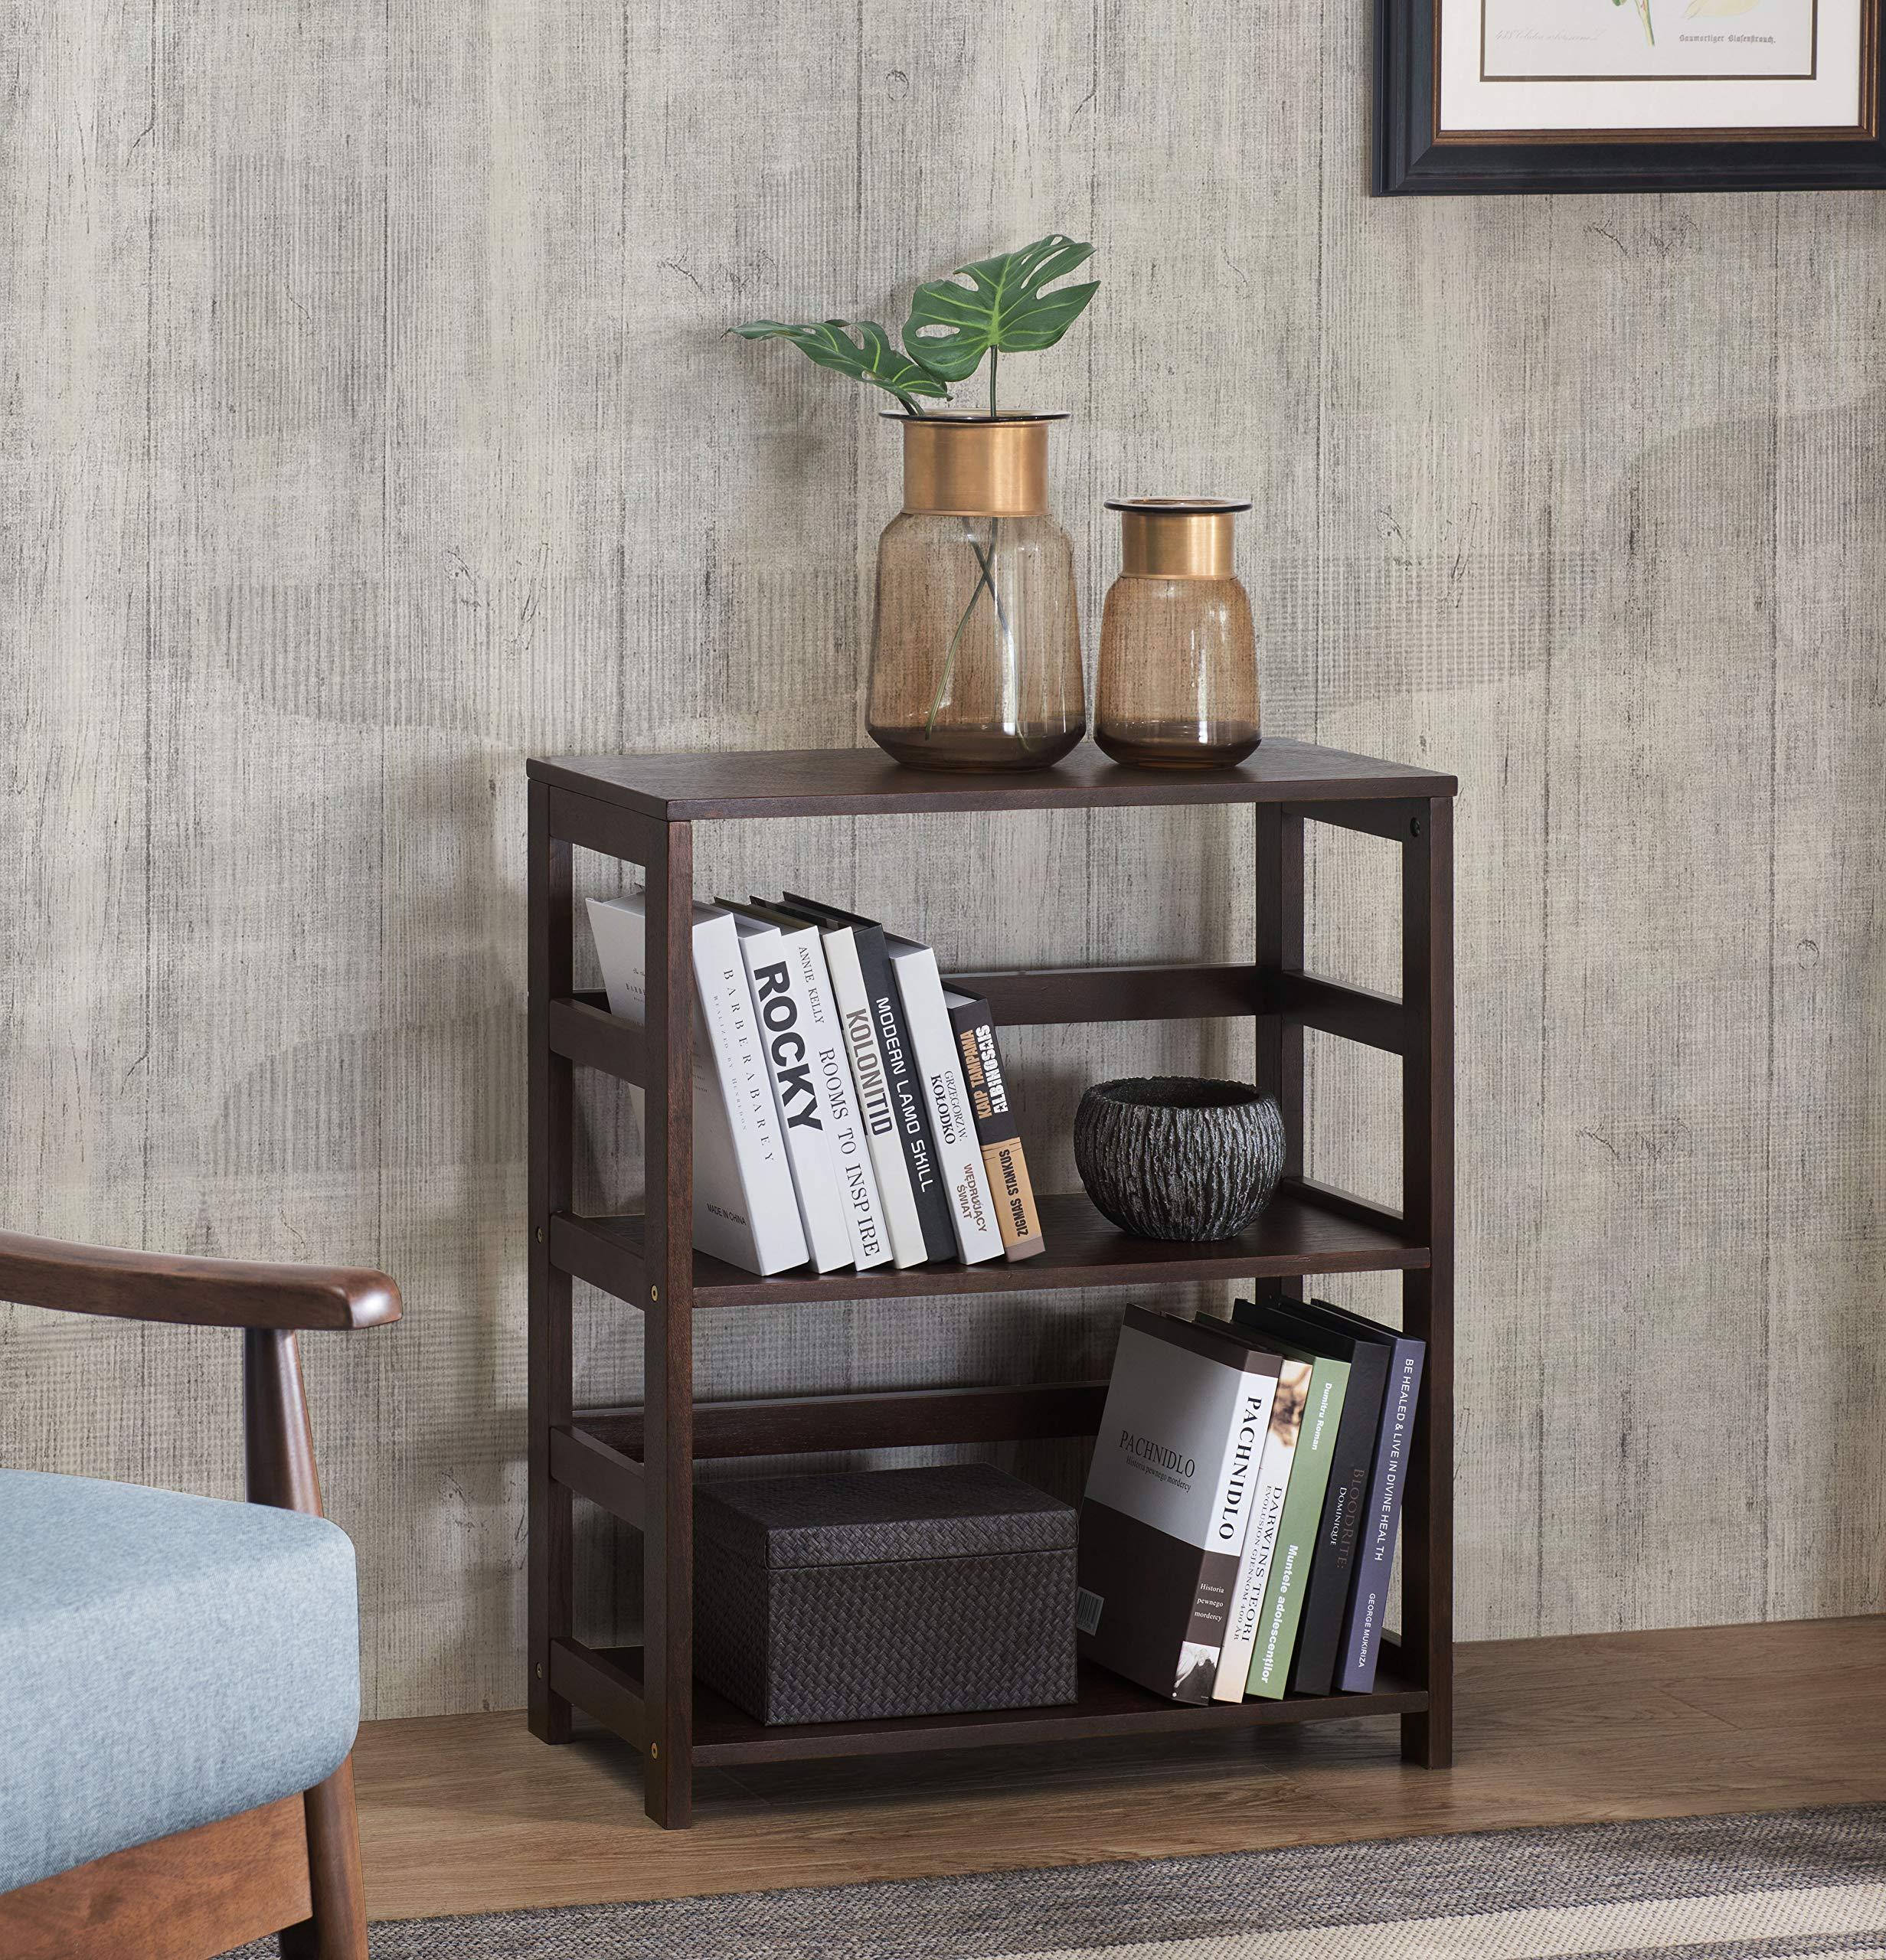 2L Lifestyle Hyder Everyday Basic Bookshelf Storage Rack Wood Shelf, Small, Brown by 2L Lifestyle (Image #1)